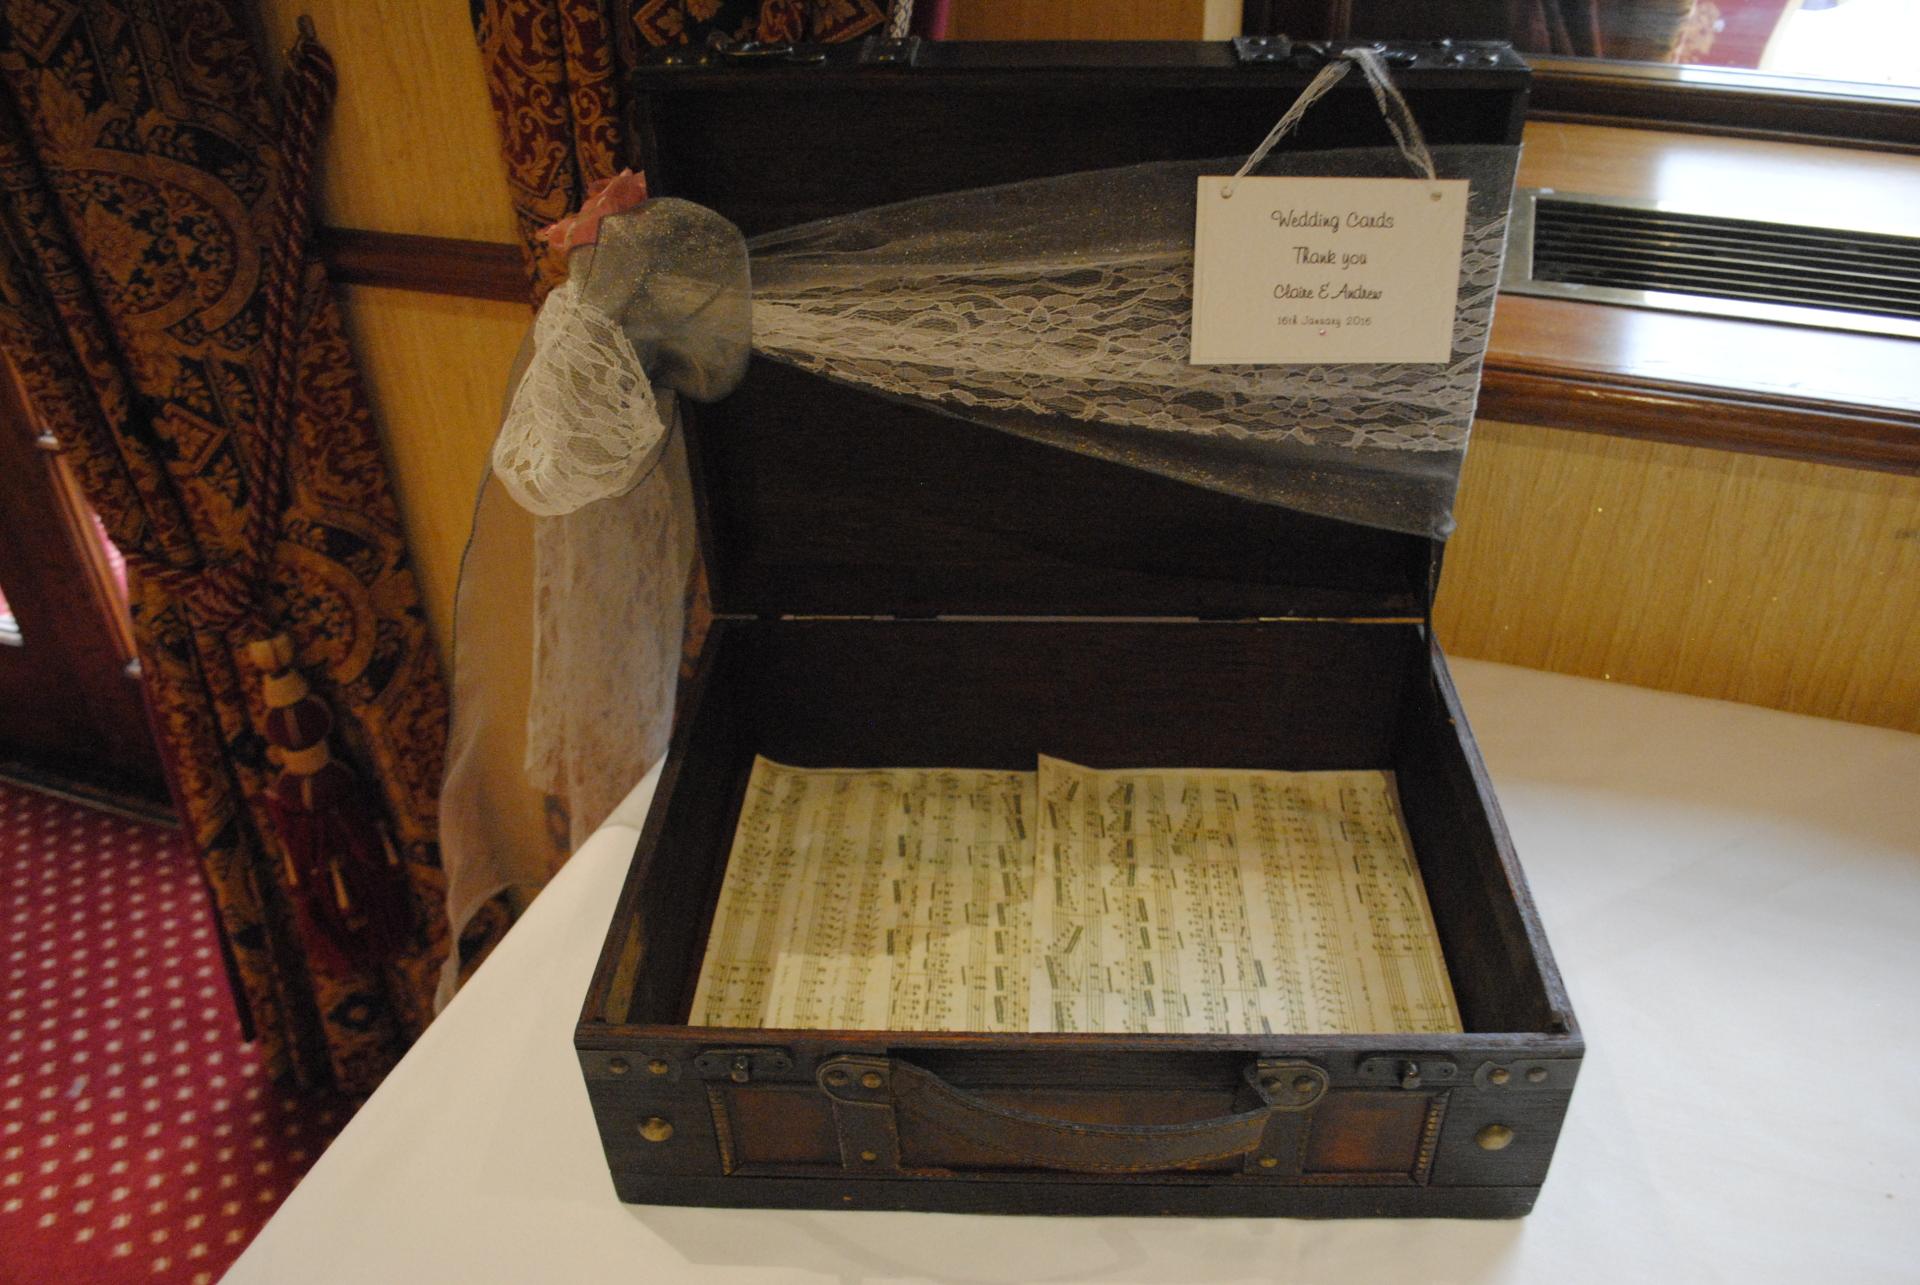 Vintage suitcase wedding card post box